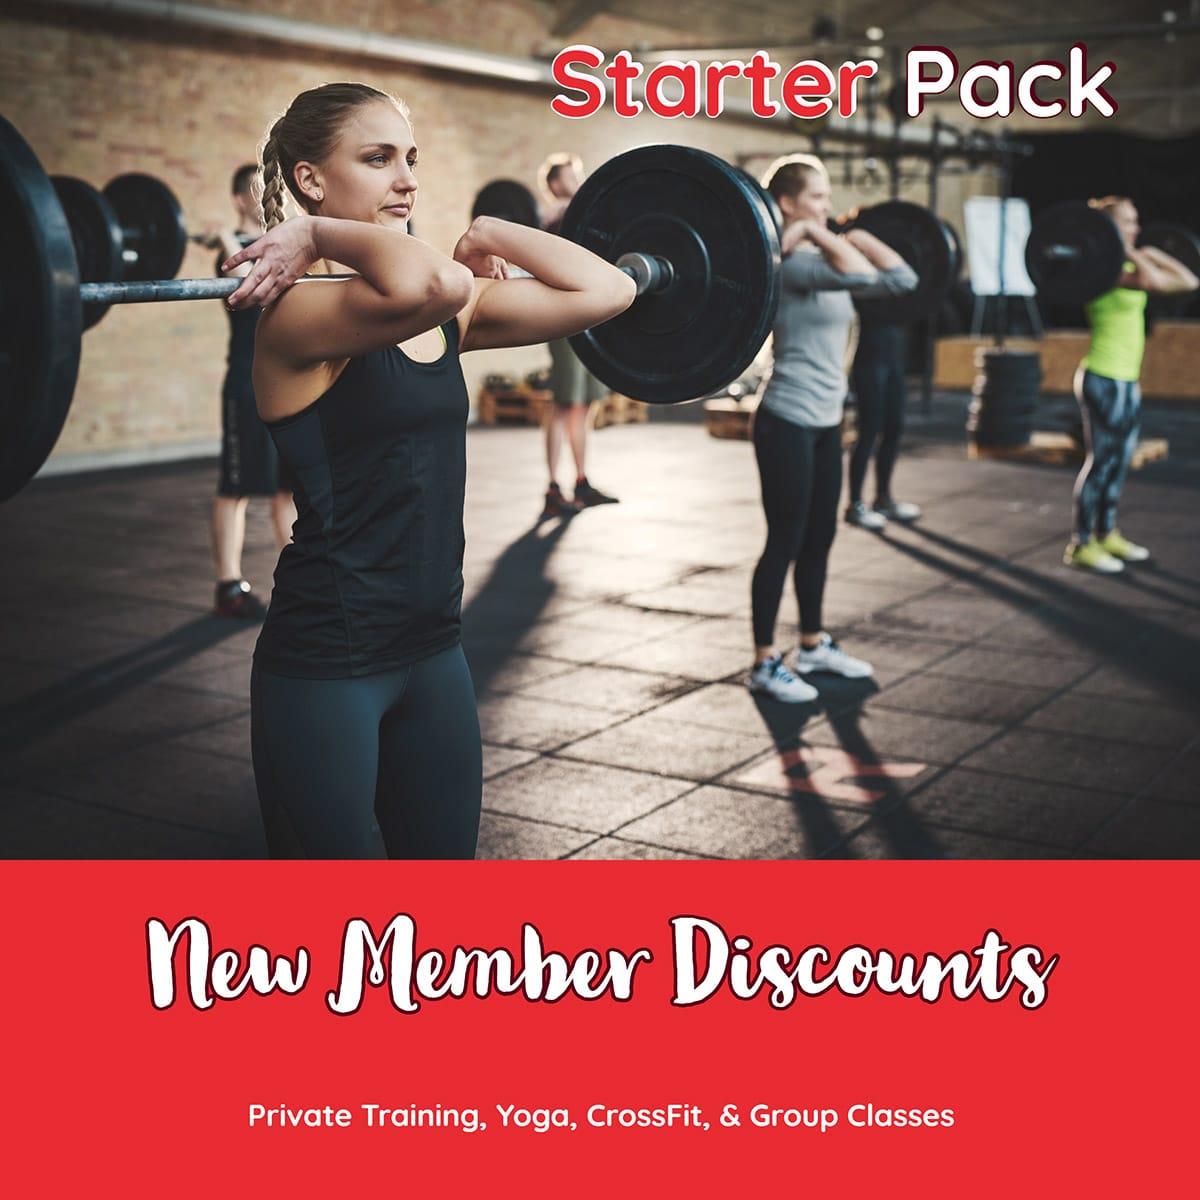 New Member Discounts